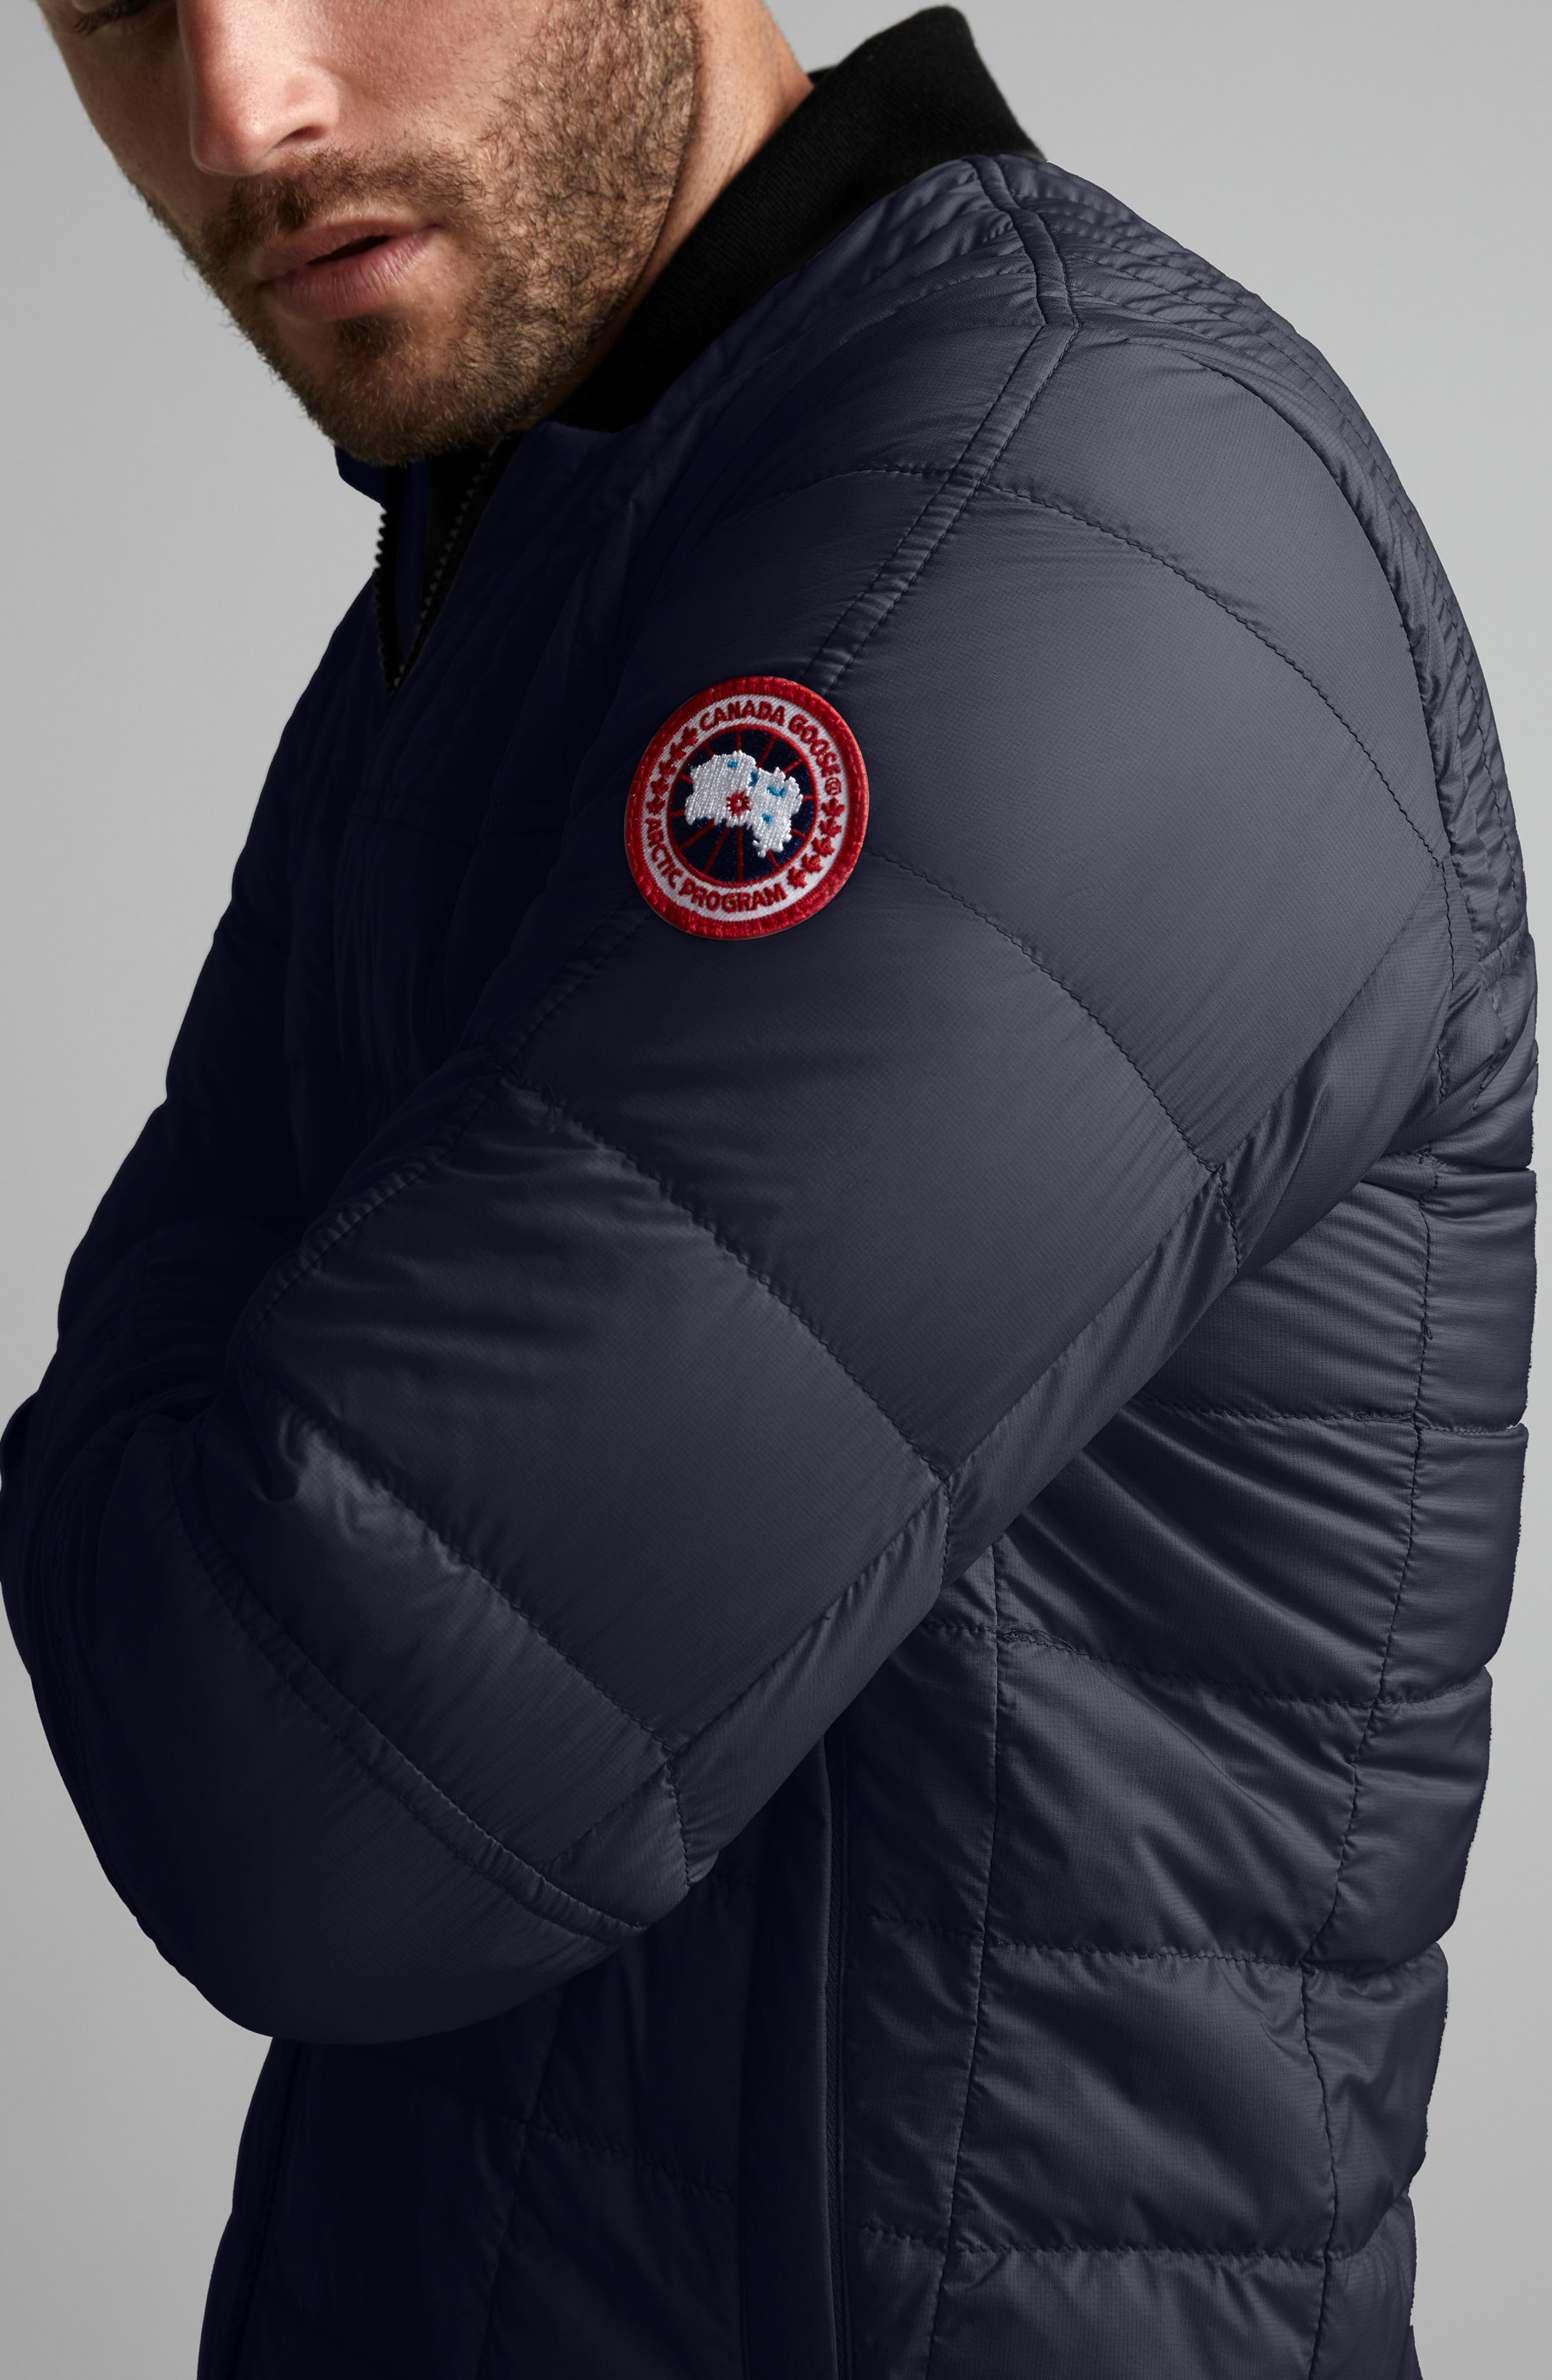 CANADA GOOSE, Dunham Slim Fit Packable Down Jacket, Alternate thumbnail 2, color, NAVY